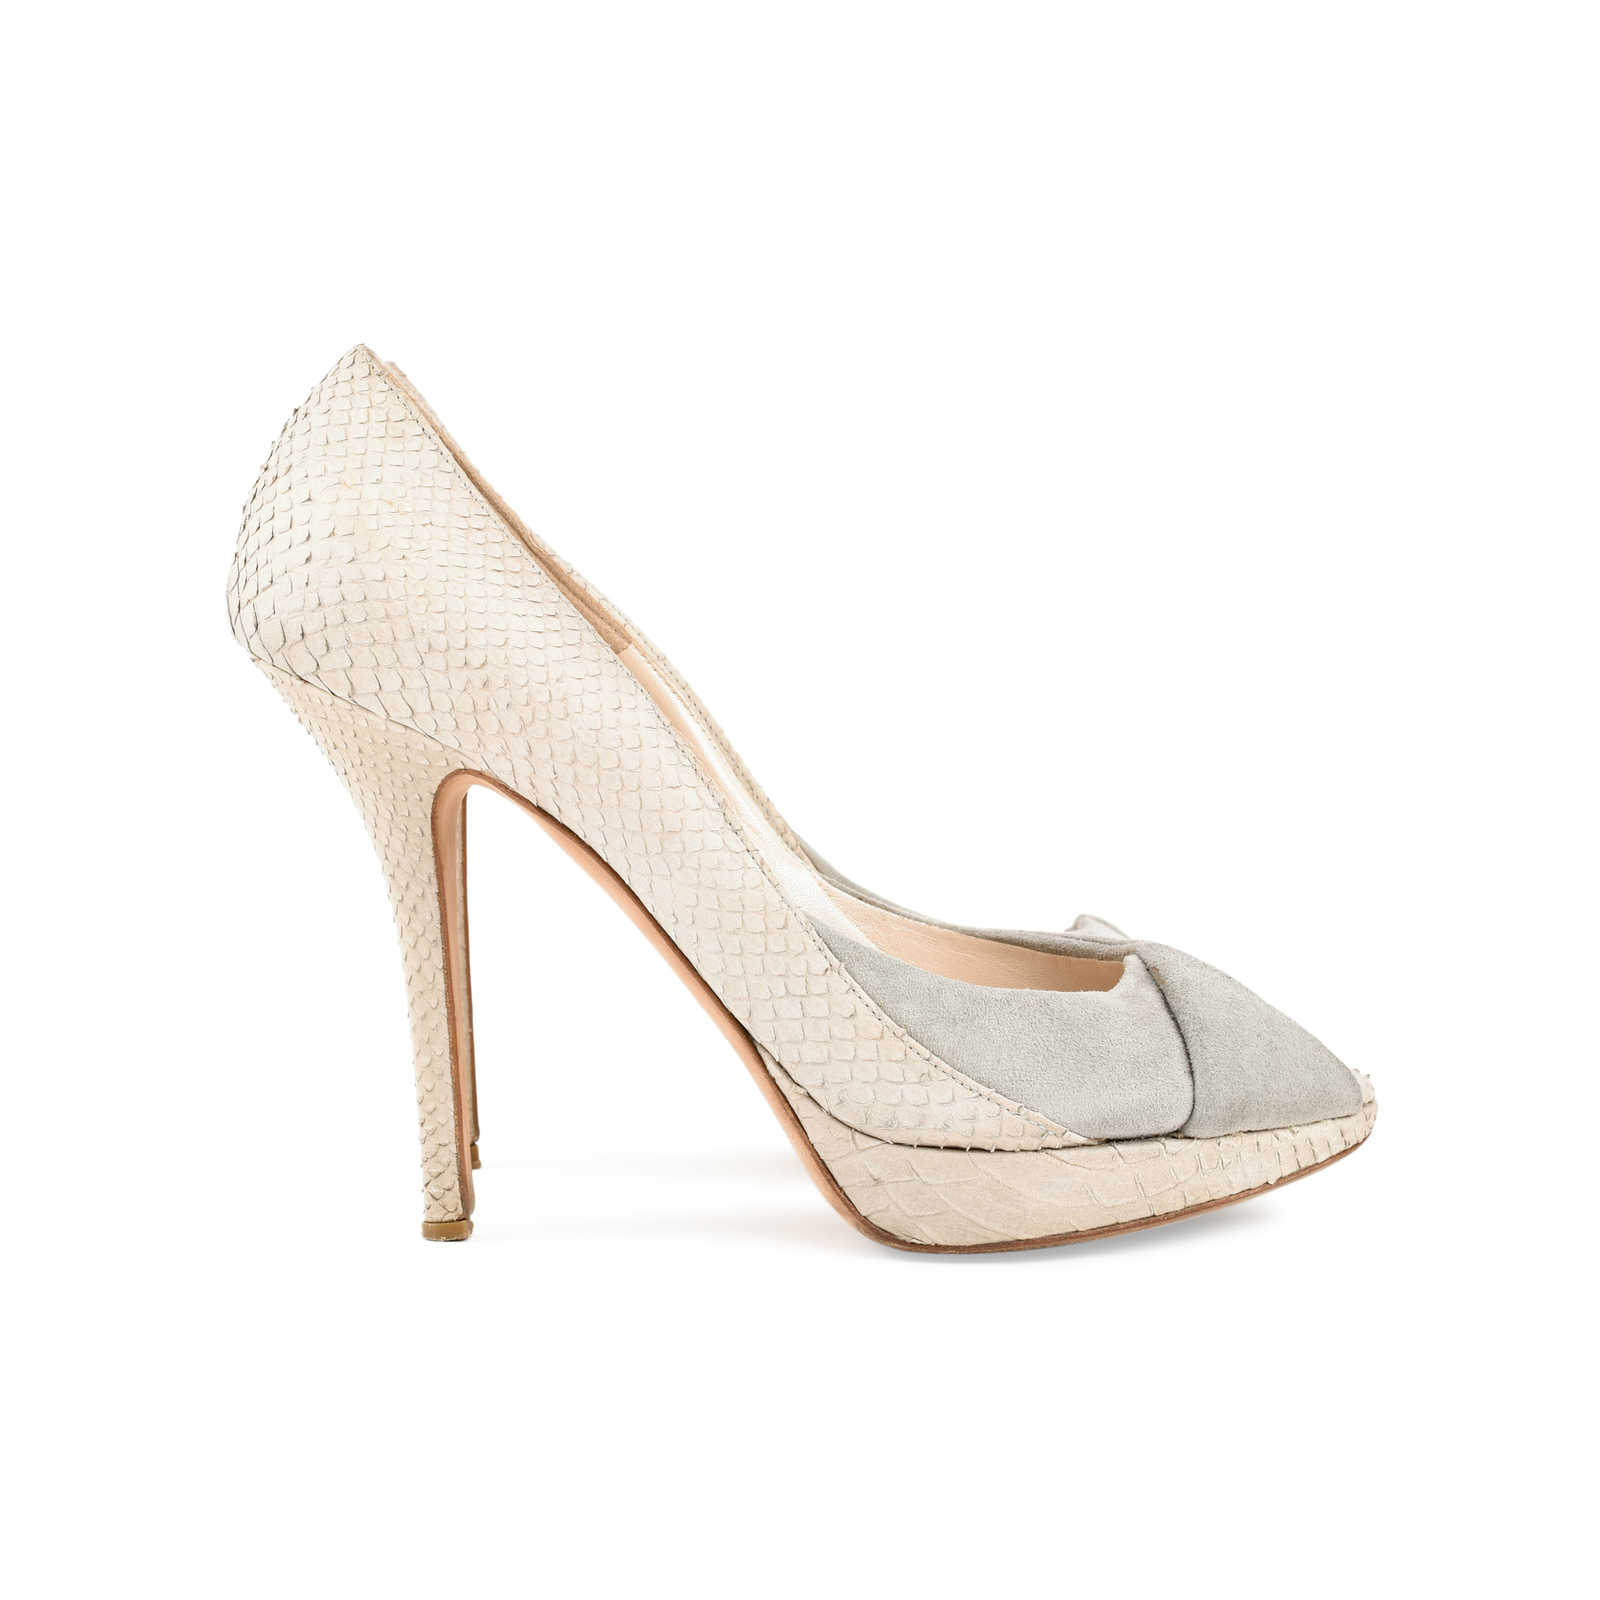 Christian Dior Embossed Peep-Toe Pumps